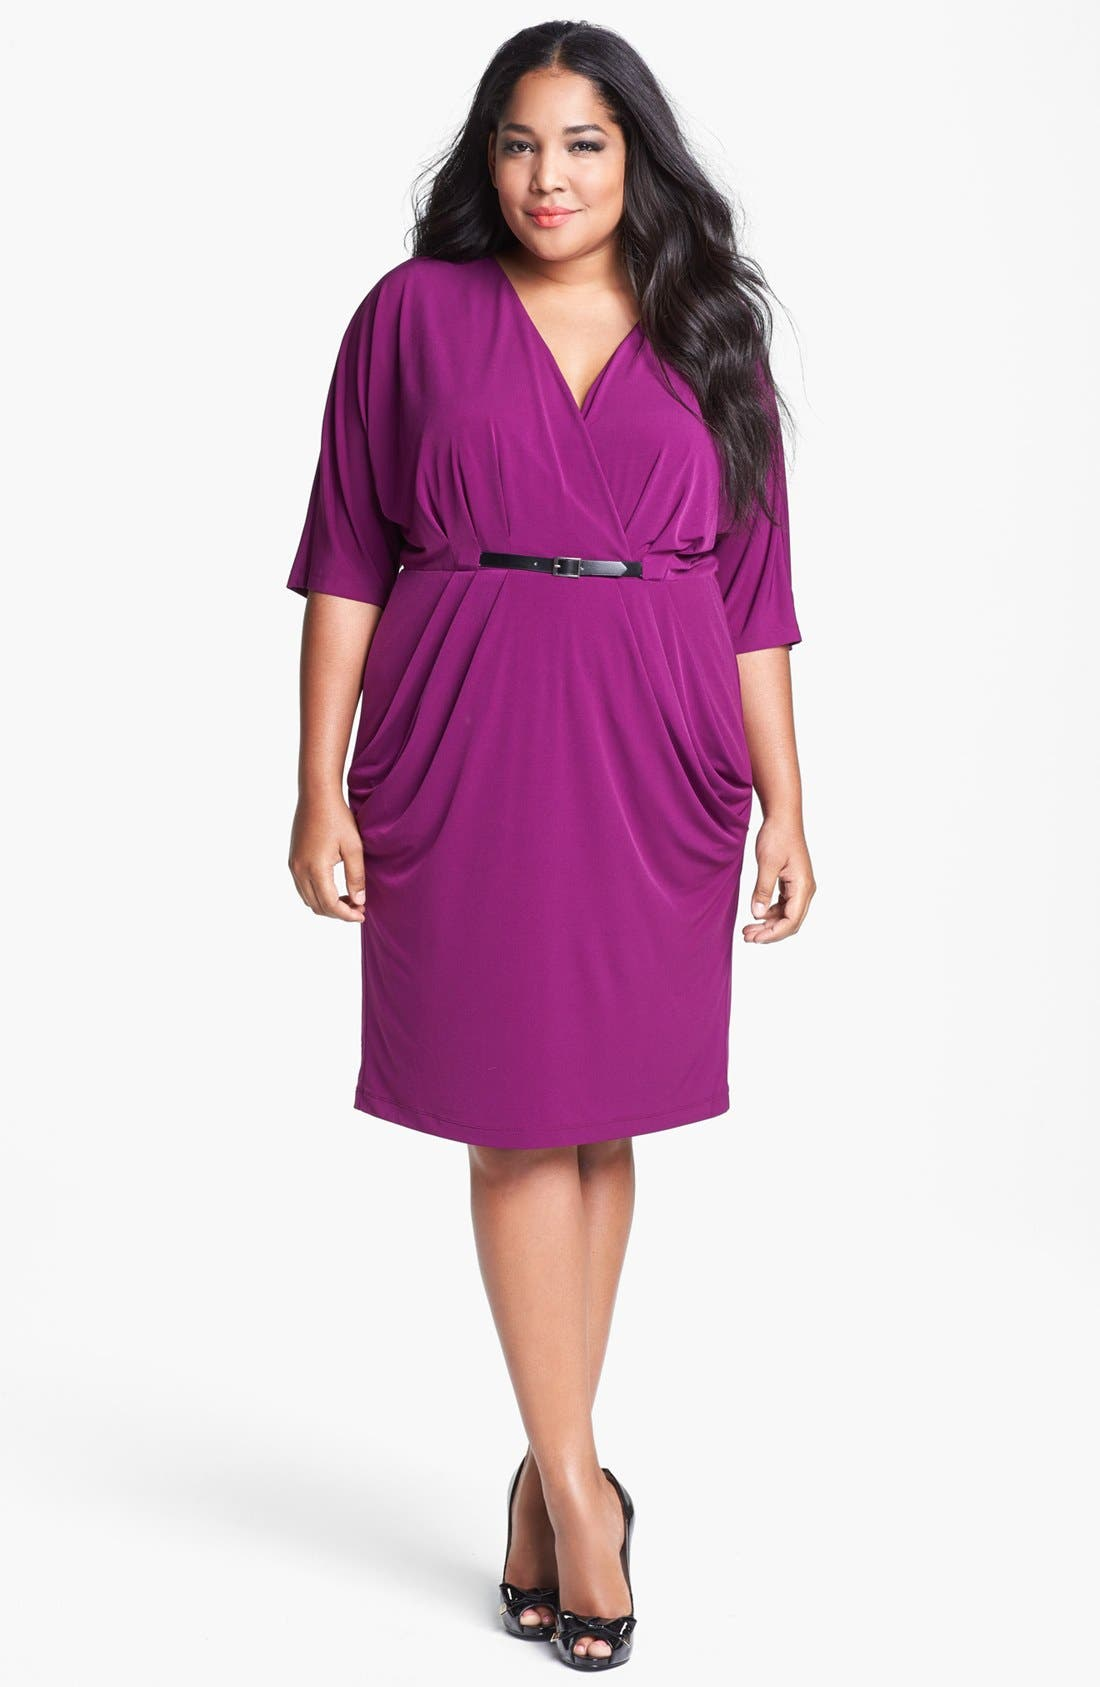 Alternate Image 1 Selected - Ivy & Blu Draped Dress (Plus Size)